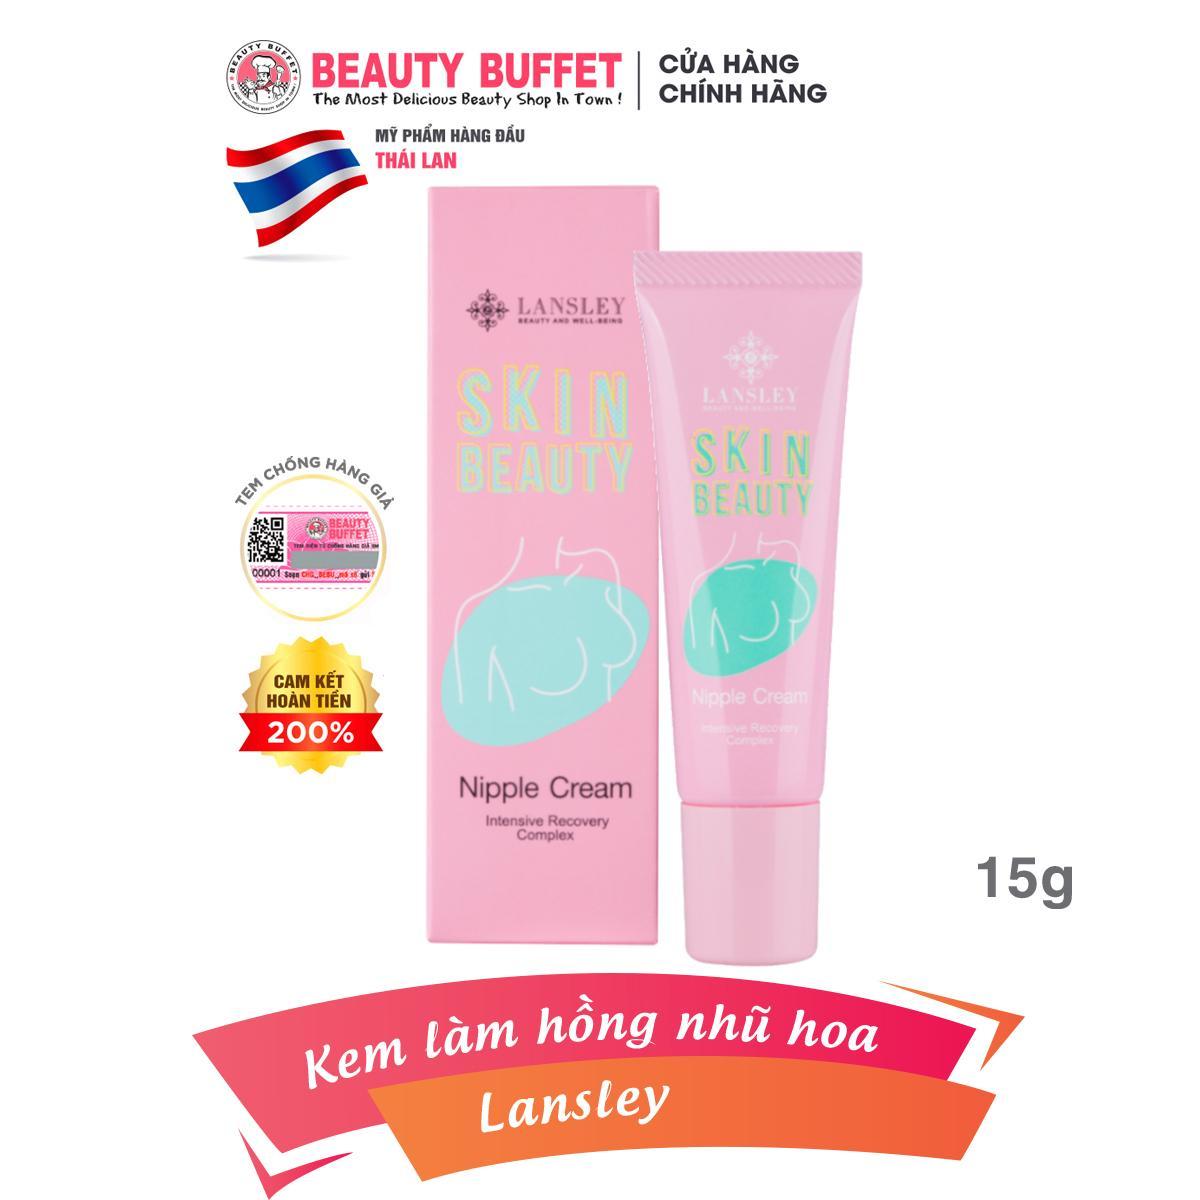 Kem làm hồng nhũ hoa Lansley Beauty Nipple Cream 15g nhập khẩu